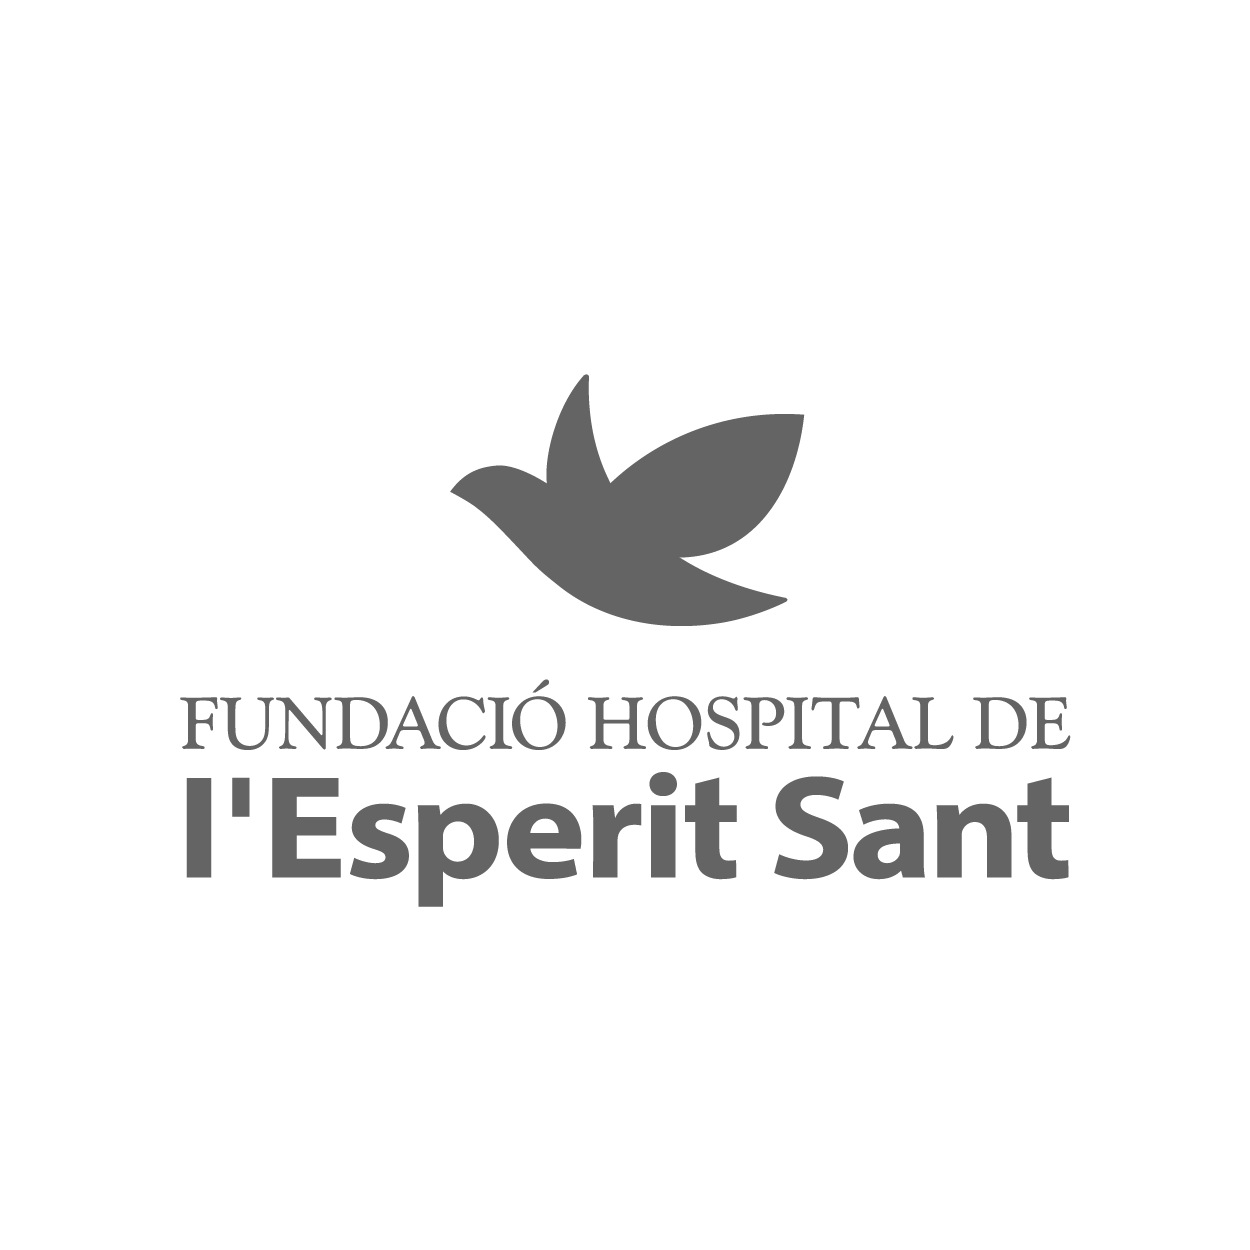 logo_F_Hospital_Esperit_Sant.png